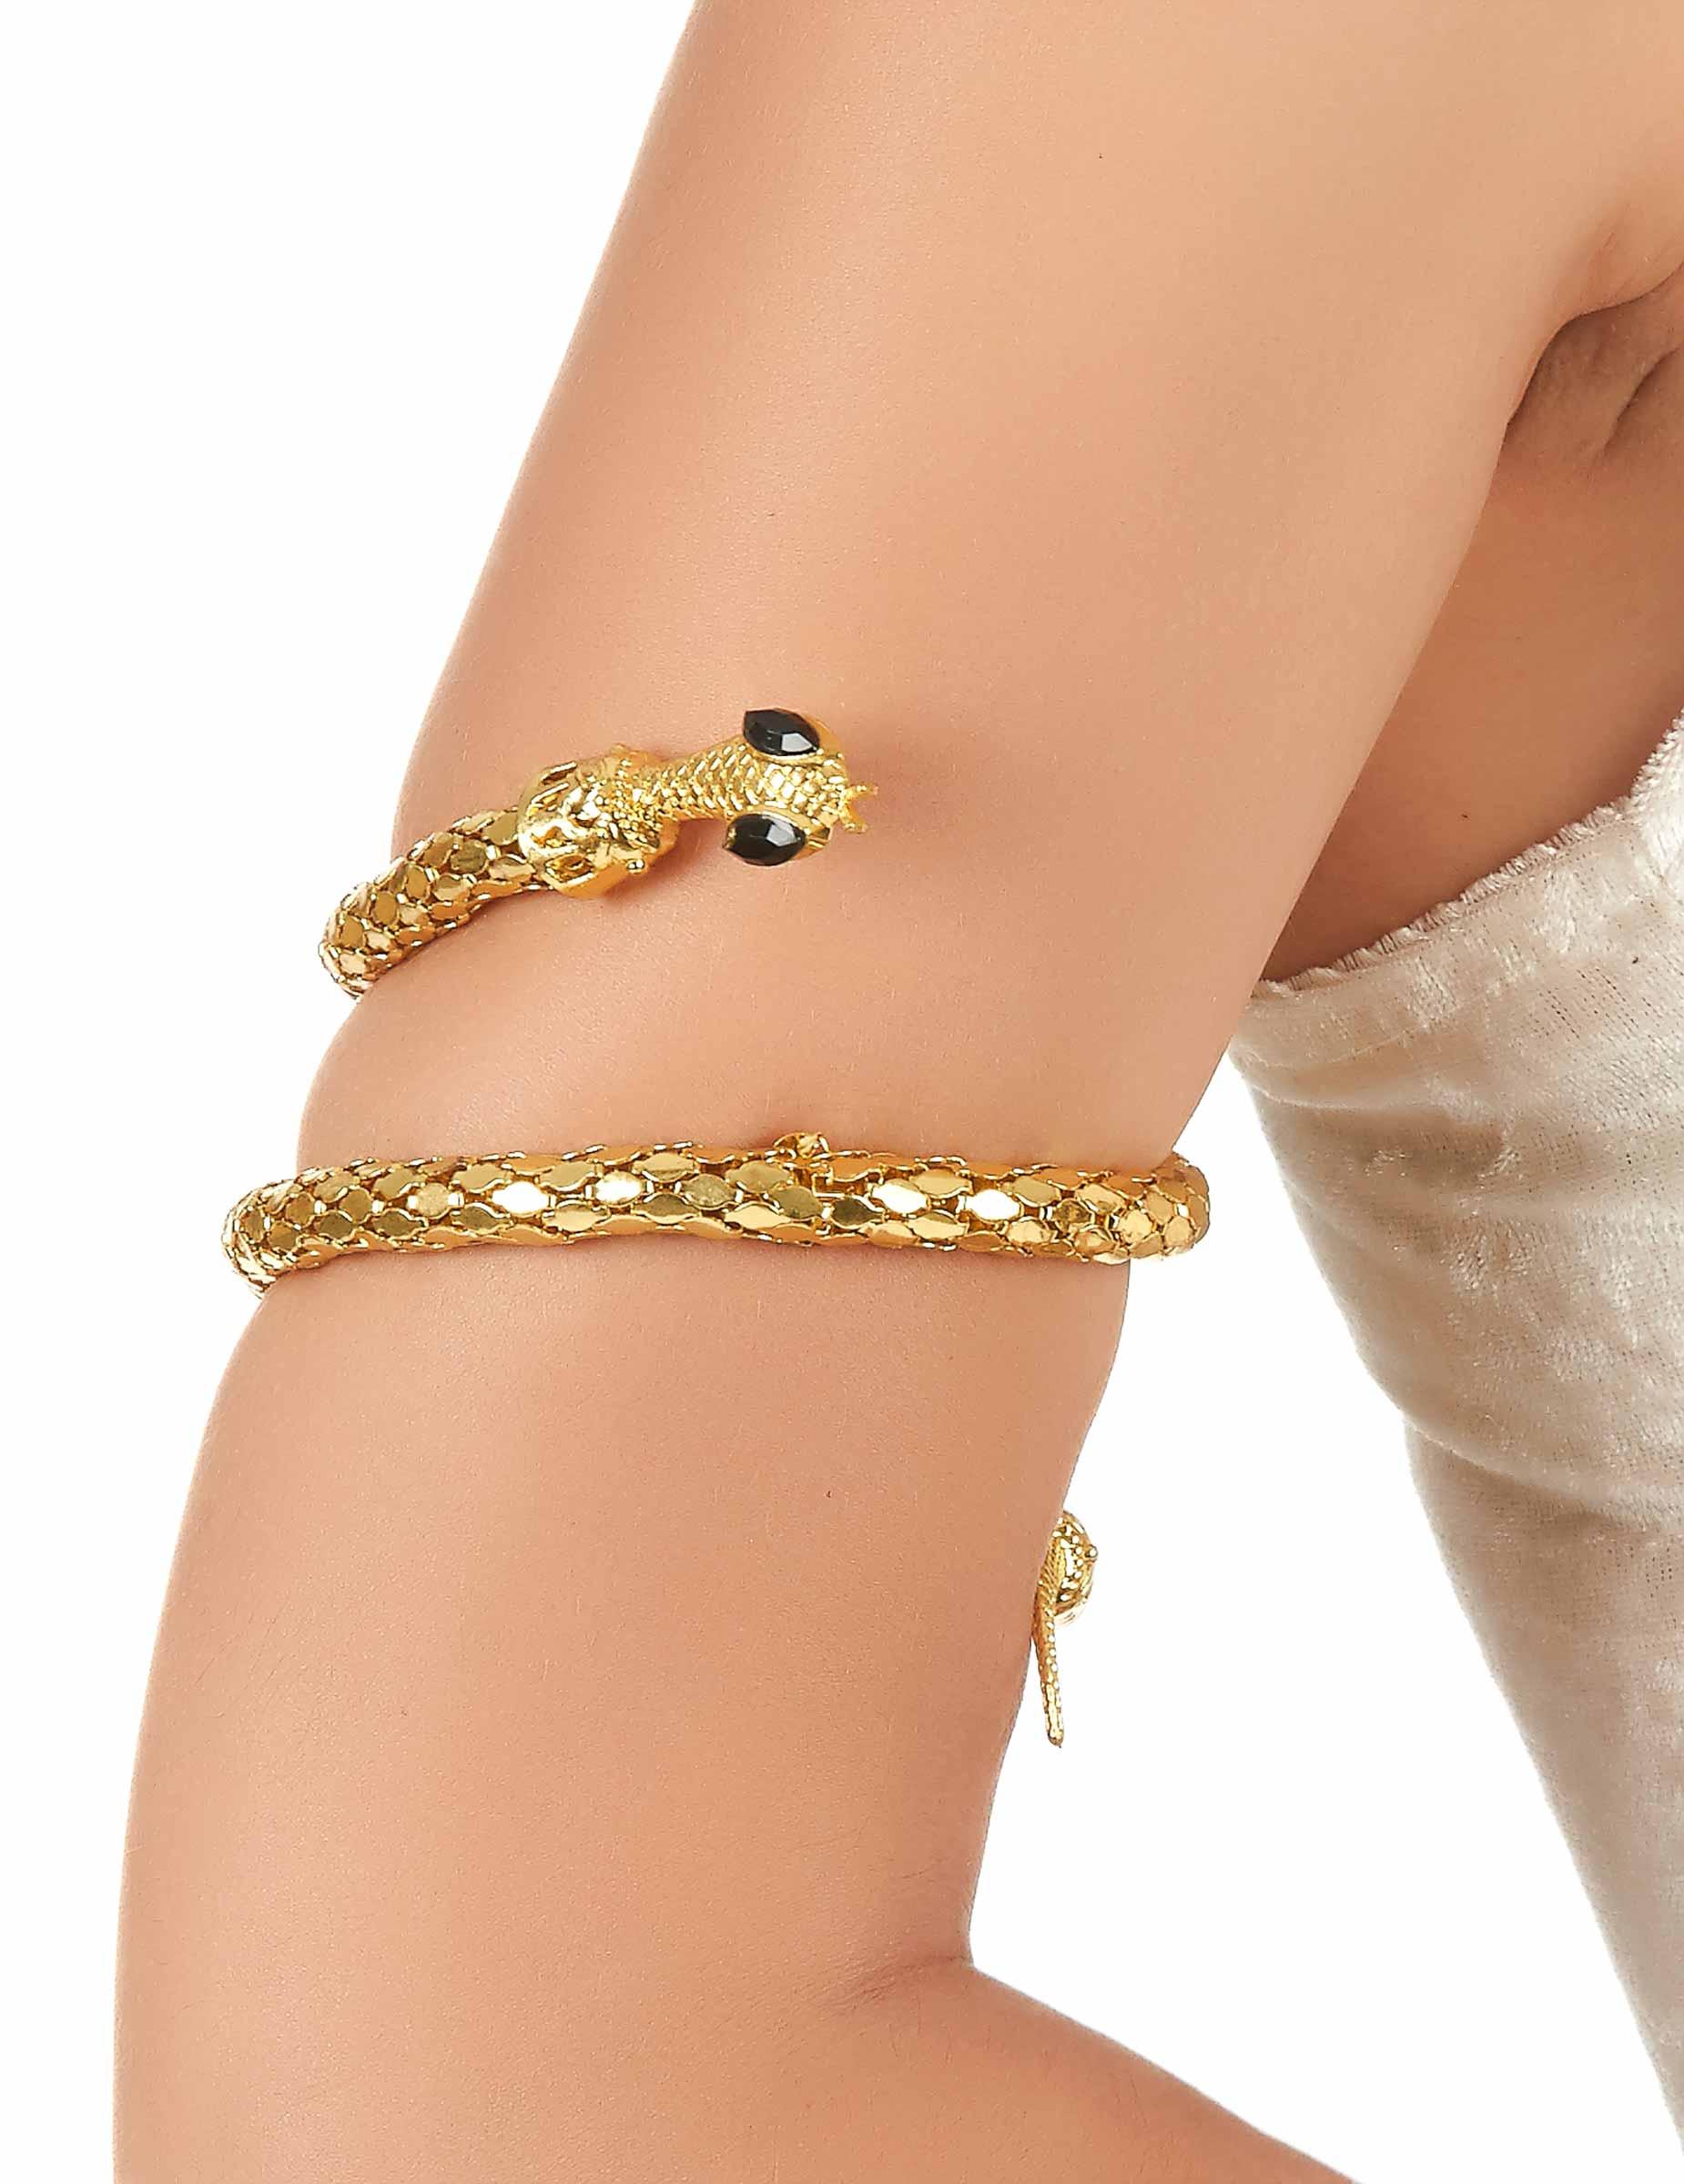 35f6bd9a8ed3 Brazalete de brazo serpiente dorada adulto  Accesorios